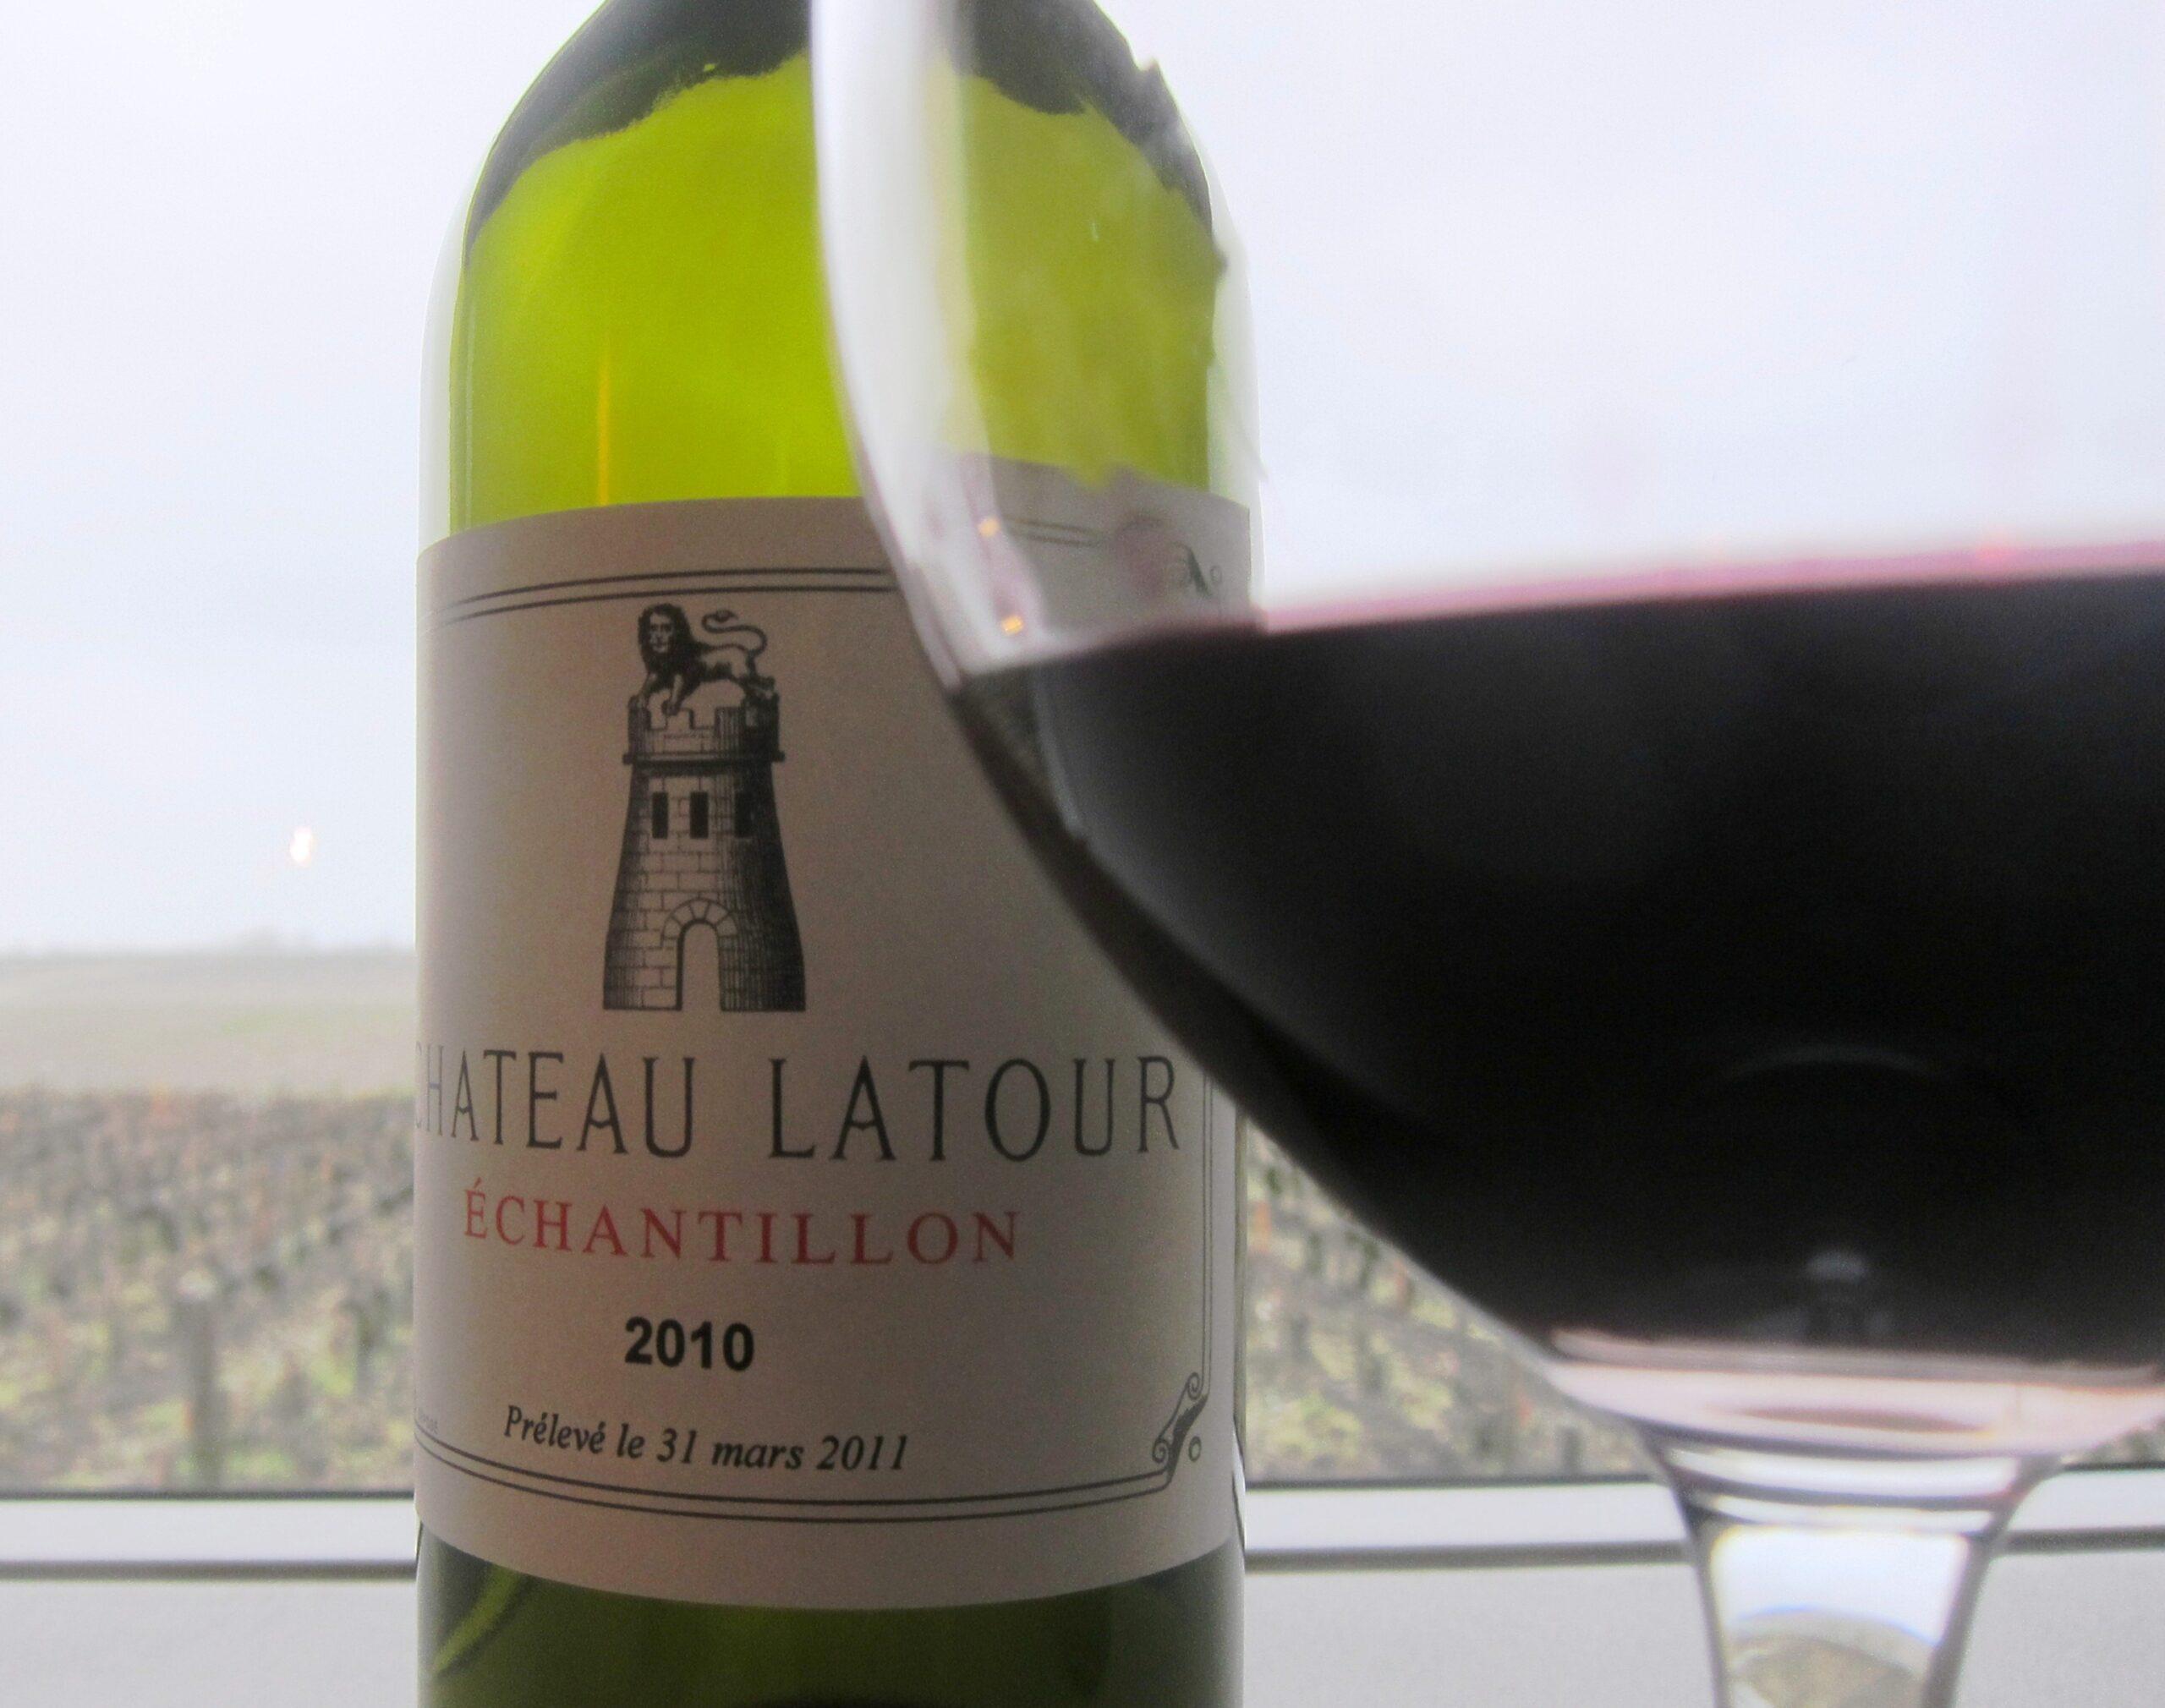 2010 Chateau Latour 1996 Latour Two Legendary Wines Tasted